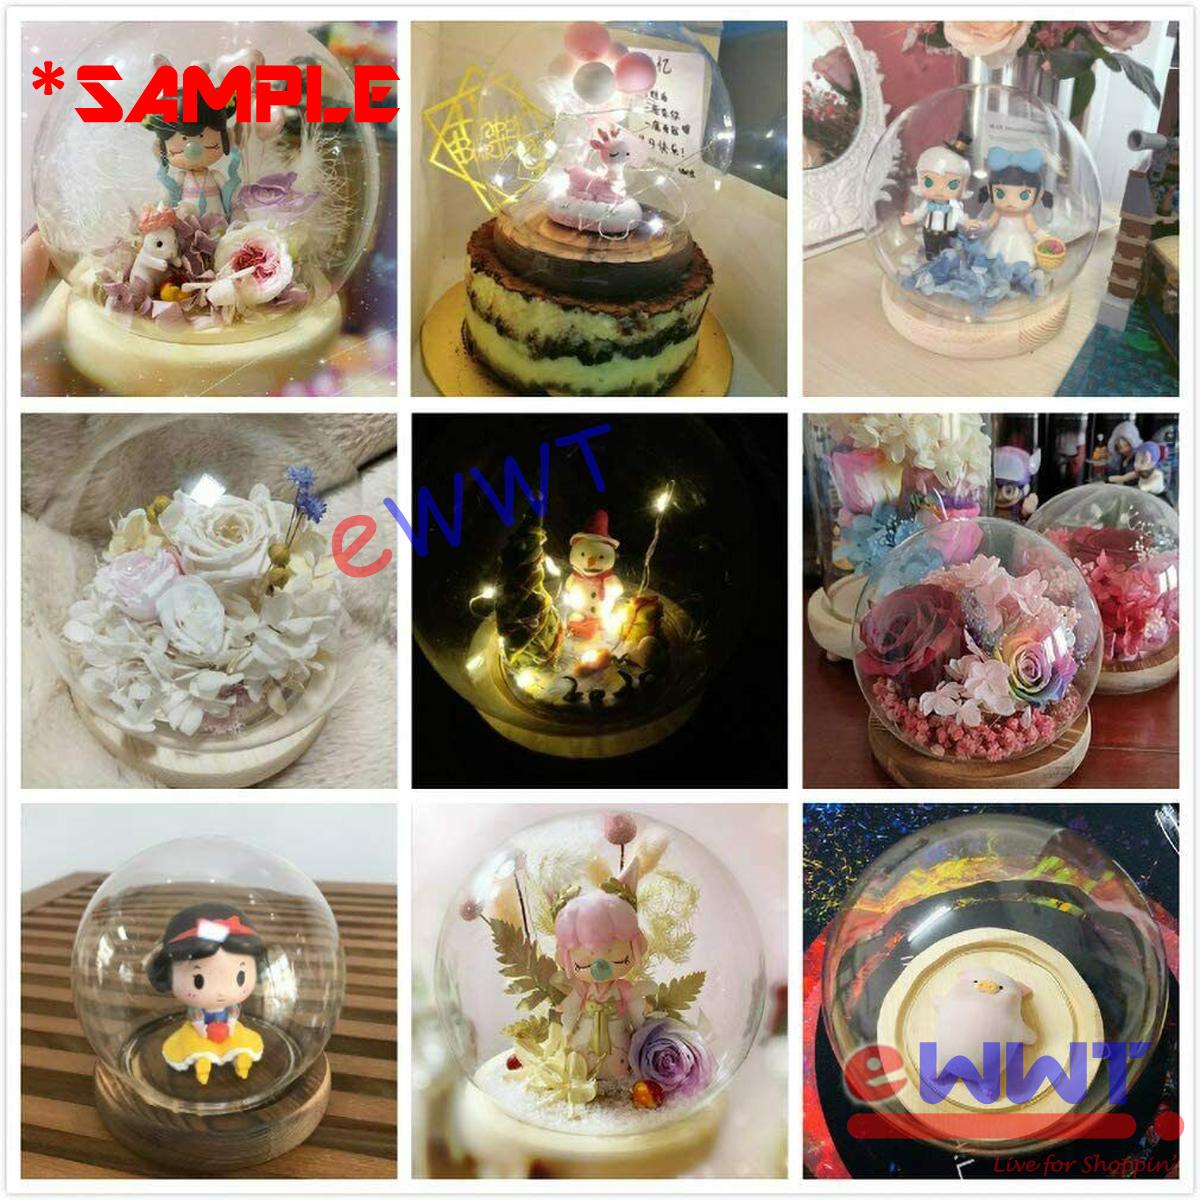 12cm Dia. Ball Globe Dome Flower Model Display Glass Case + Wooden Base LQOU091